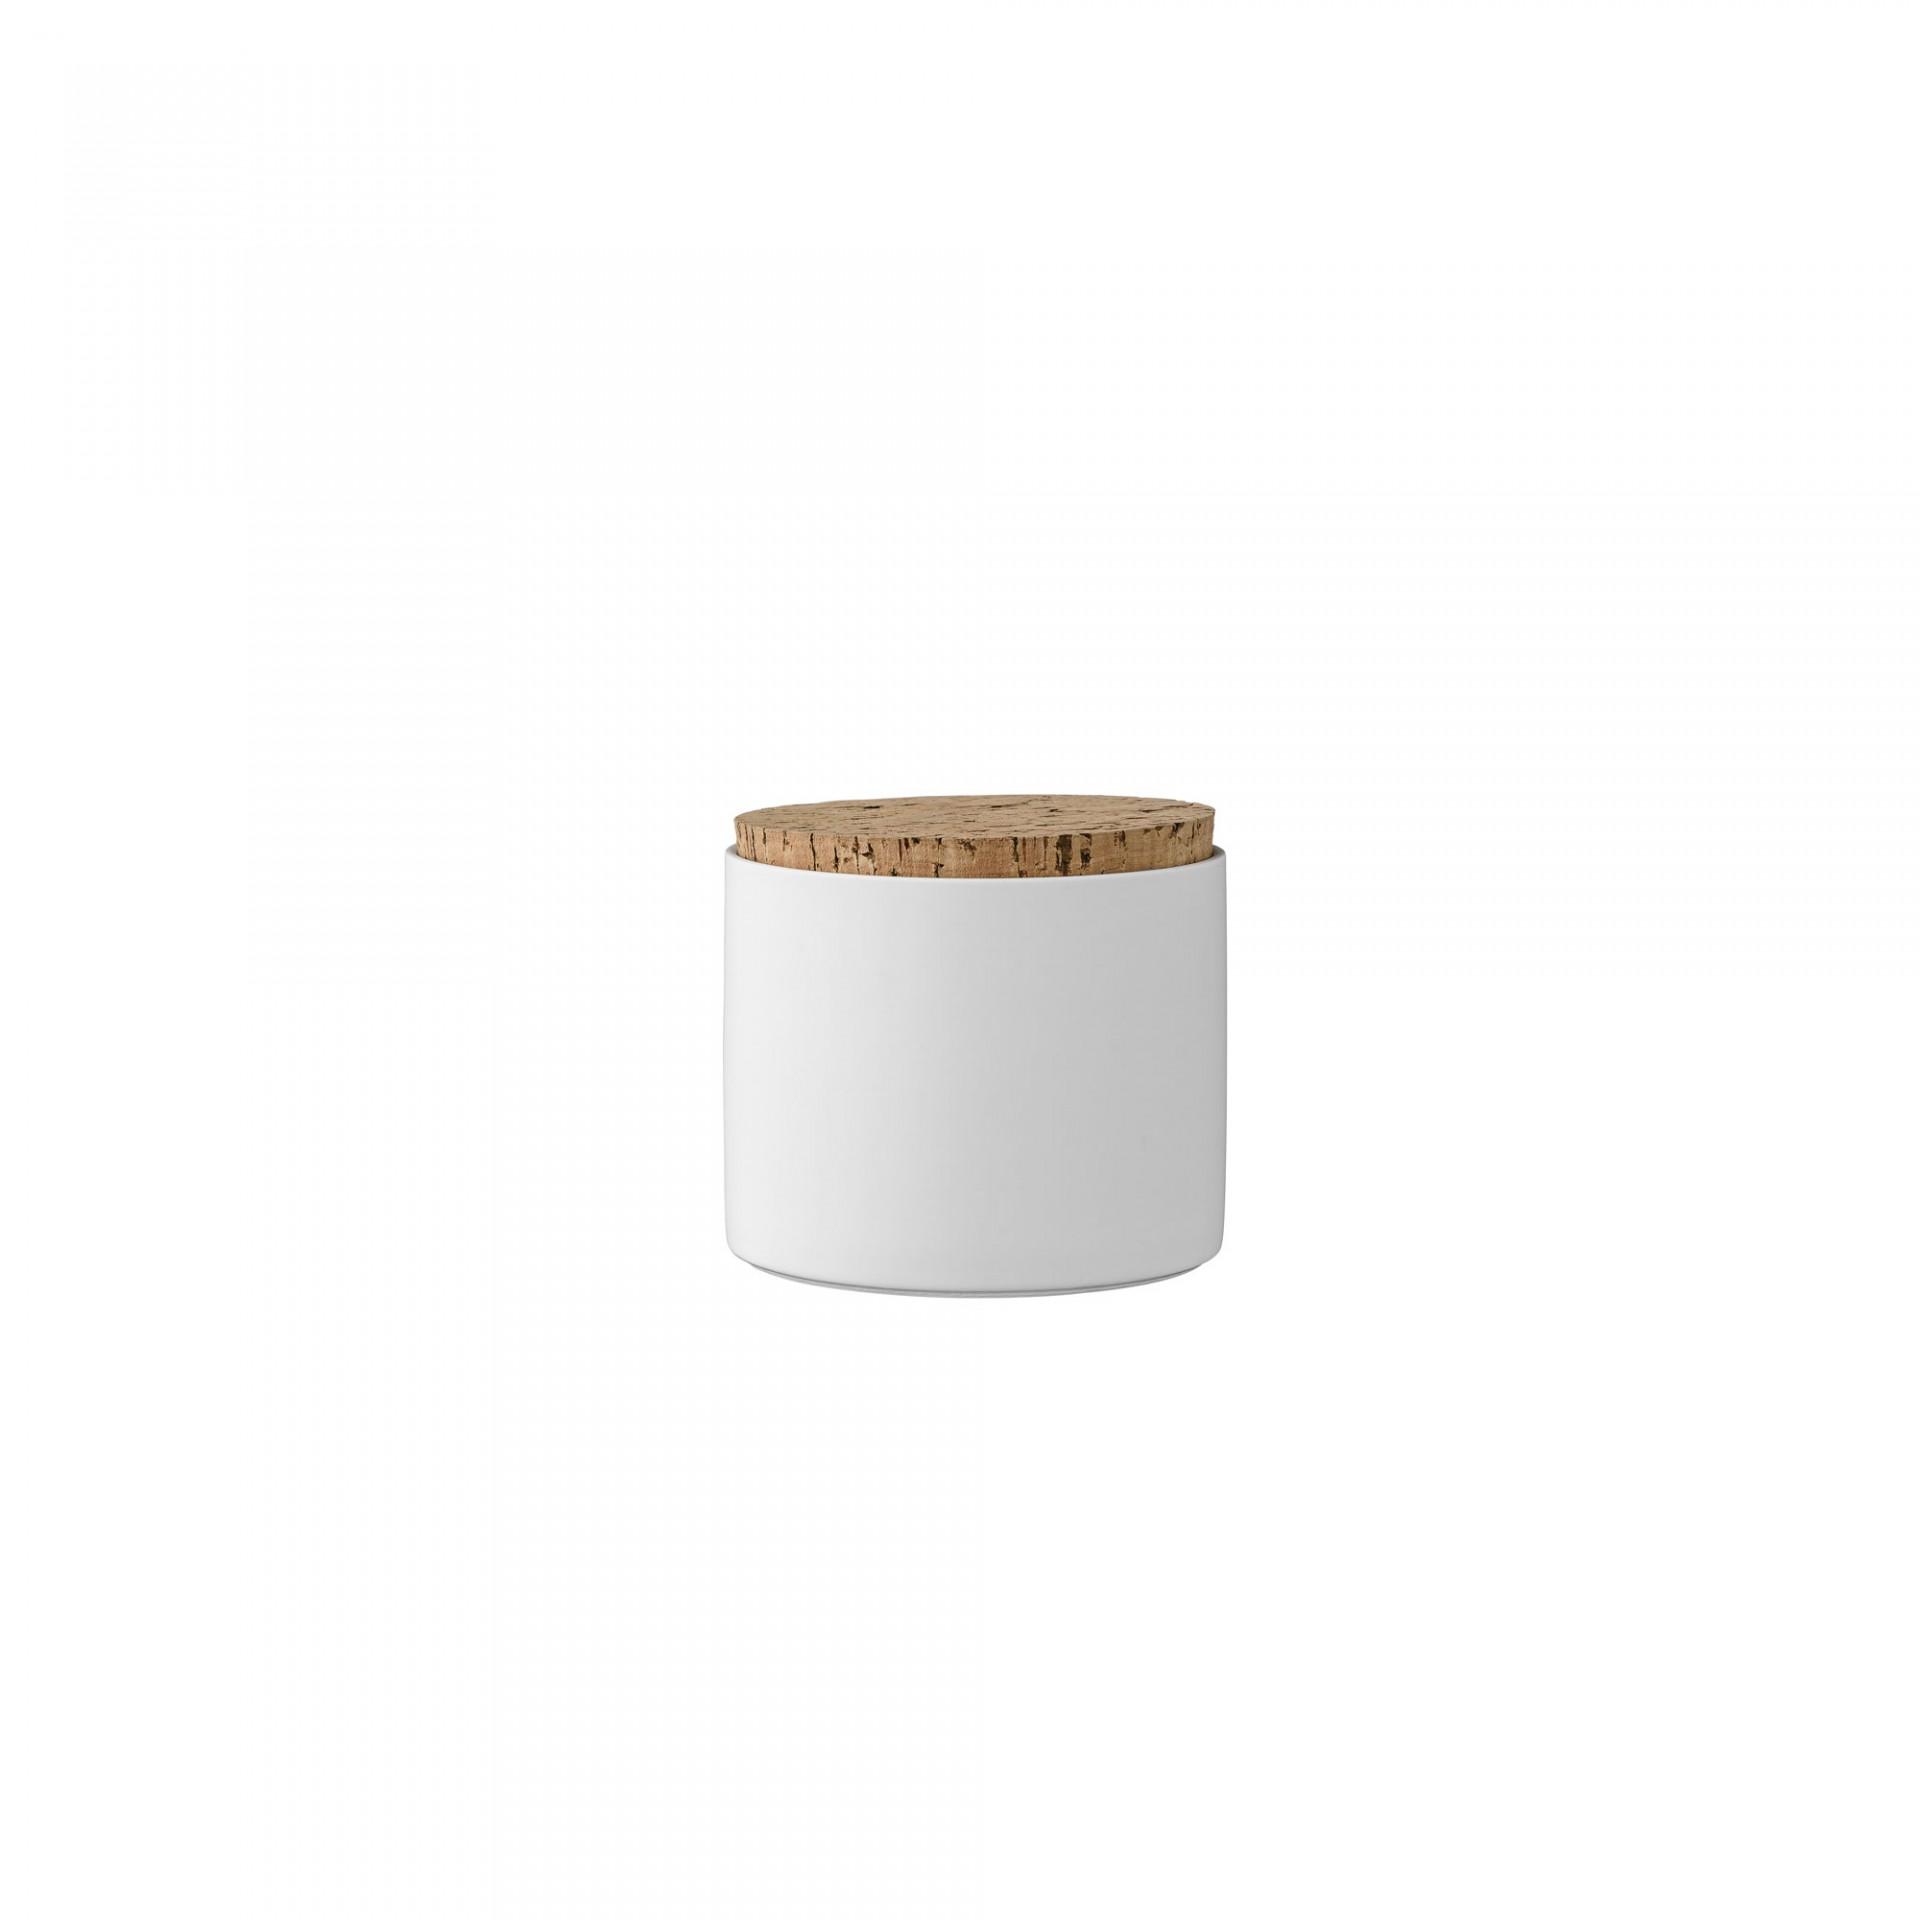 Pote em porcelana c/tampa de cortiça, branco, Ø11x12